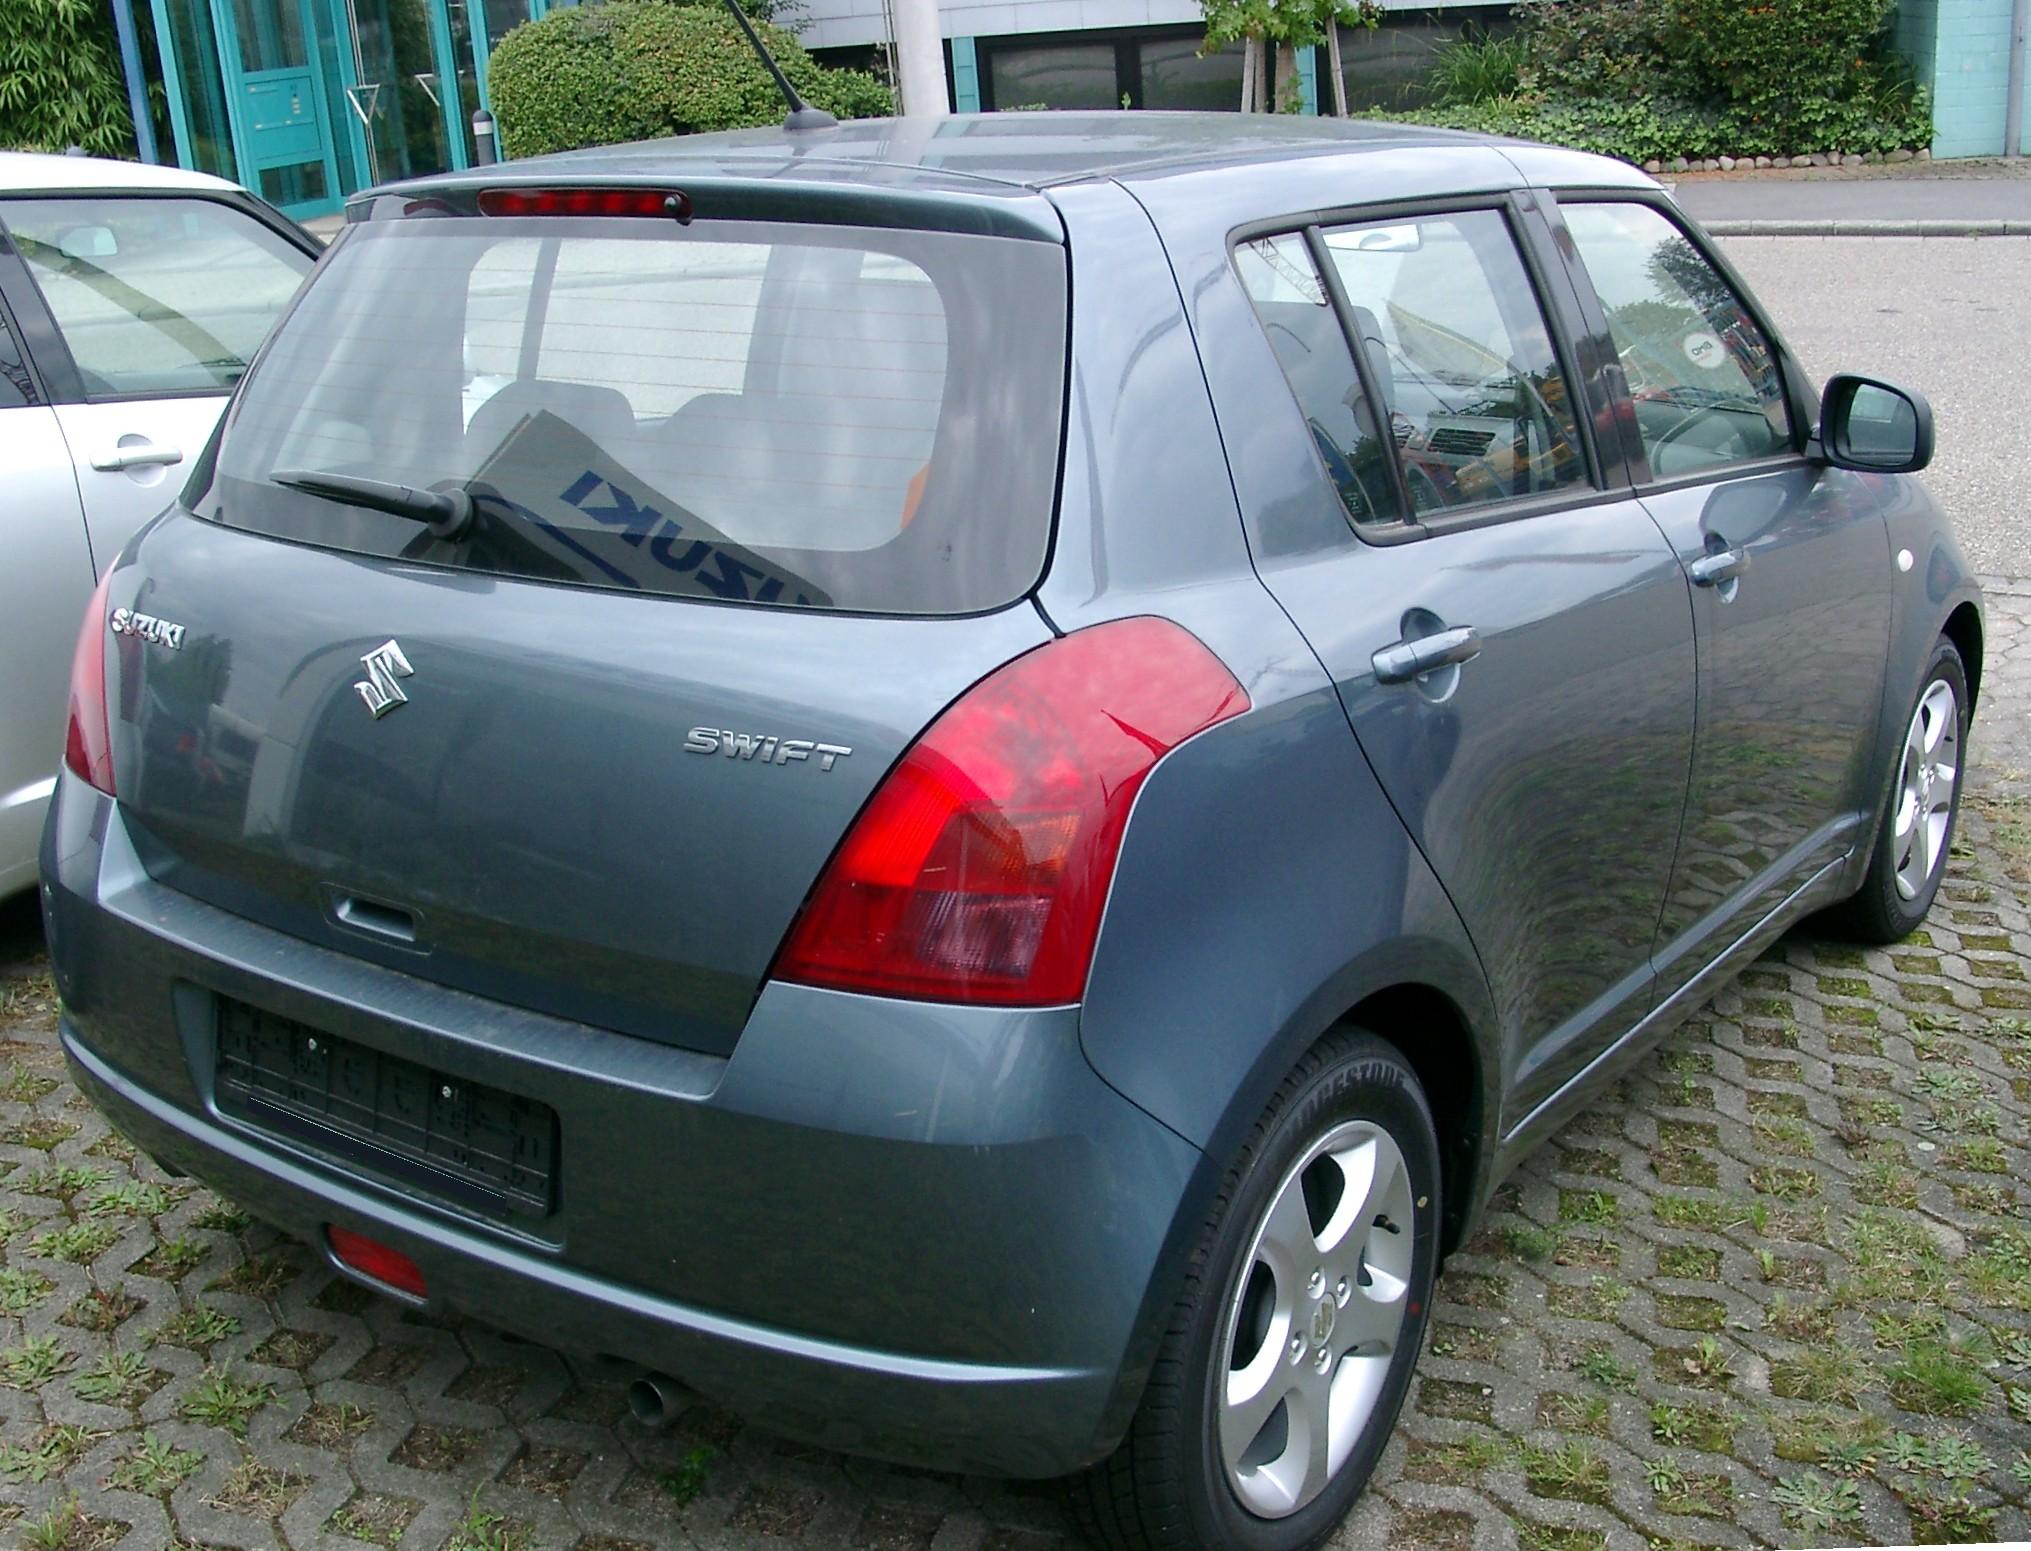 Fájl:Suzuki Swift Rear 20070902.jpg